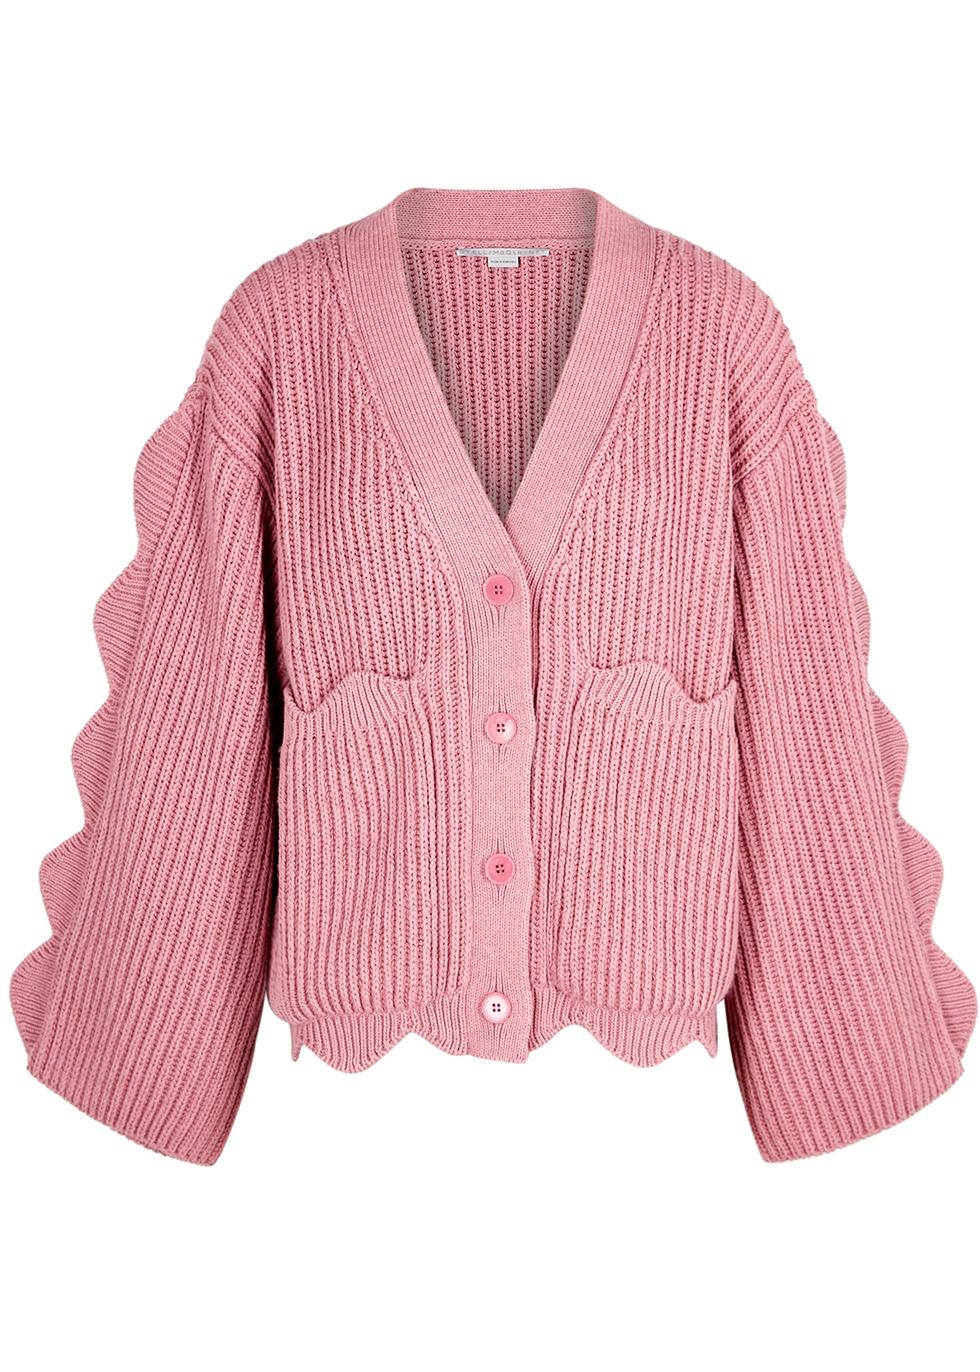 45d59484c Women s Designer Knitwear and Jumpers - Harvey Nichols